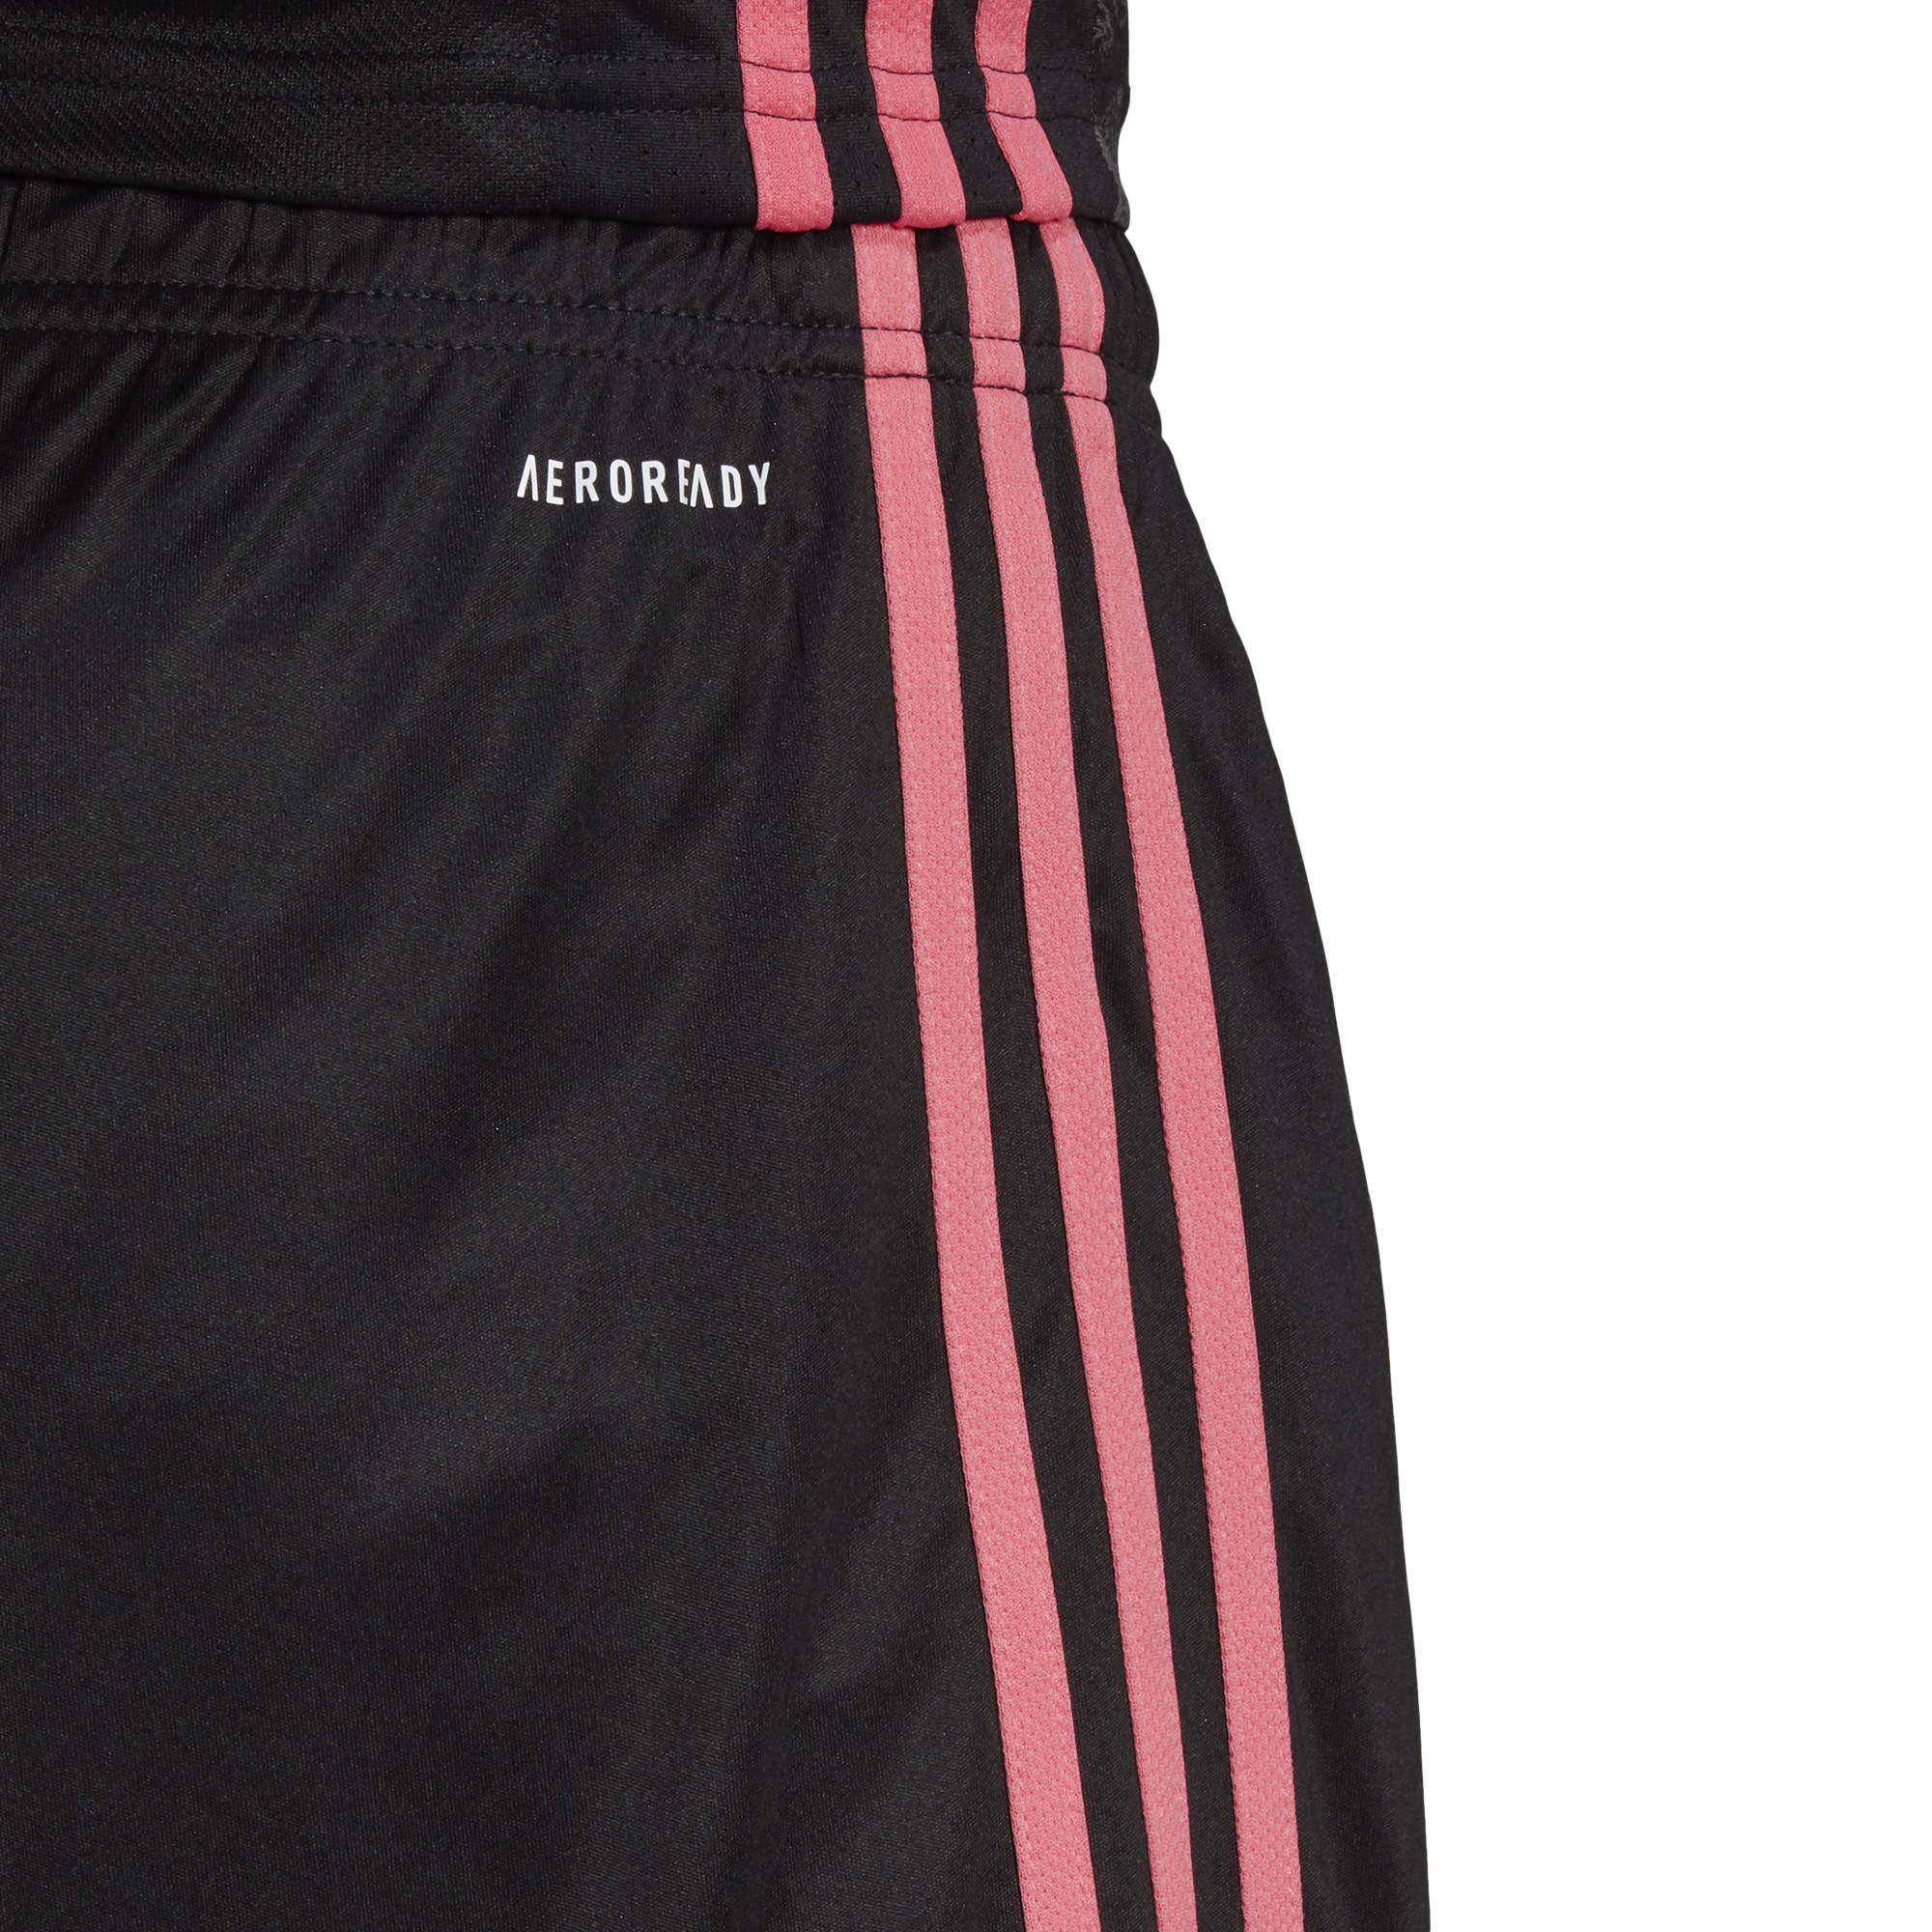 Adidas ADIDAS Real Madrid 3rd Short '20-'21